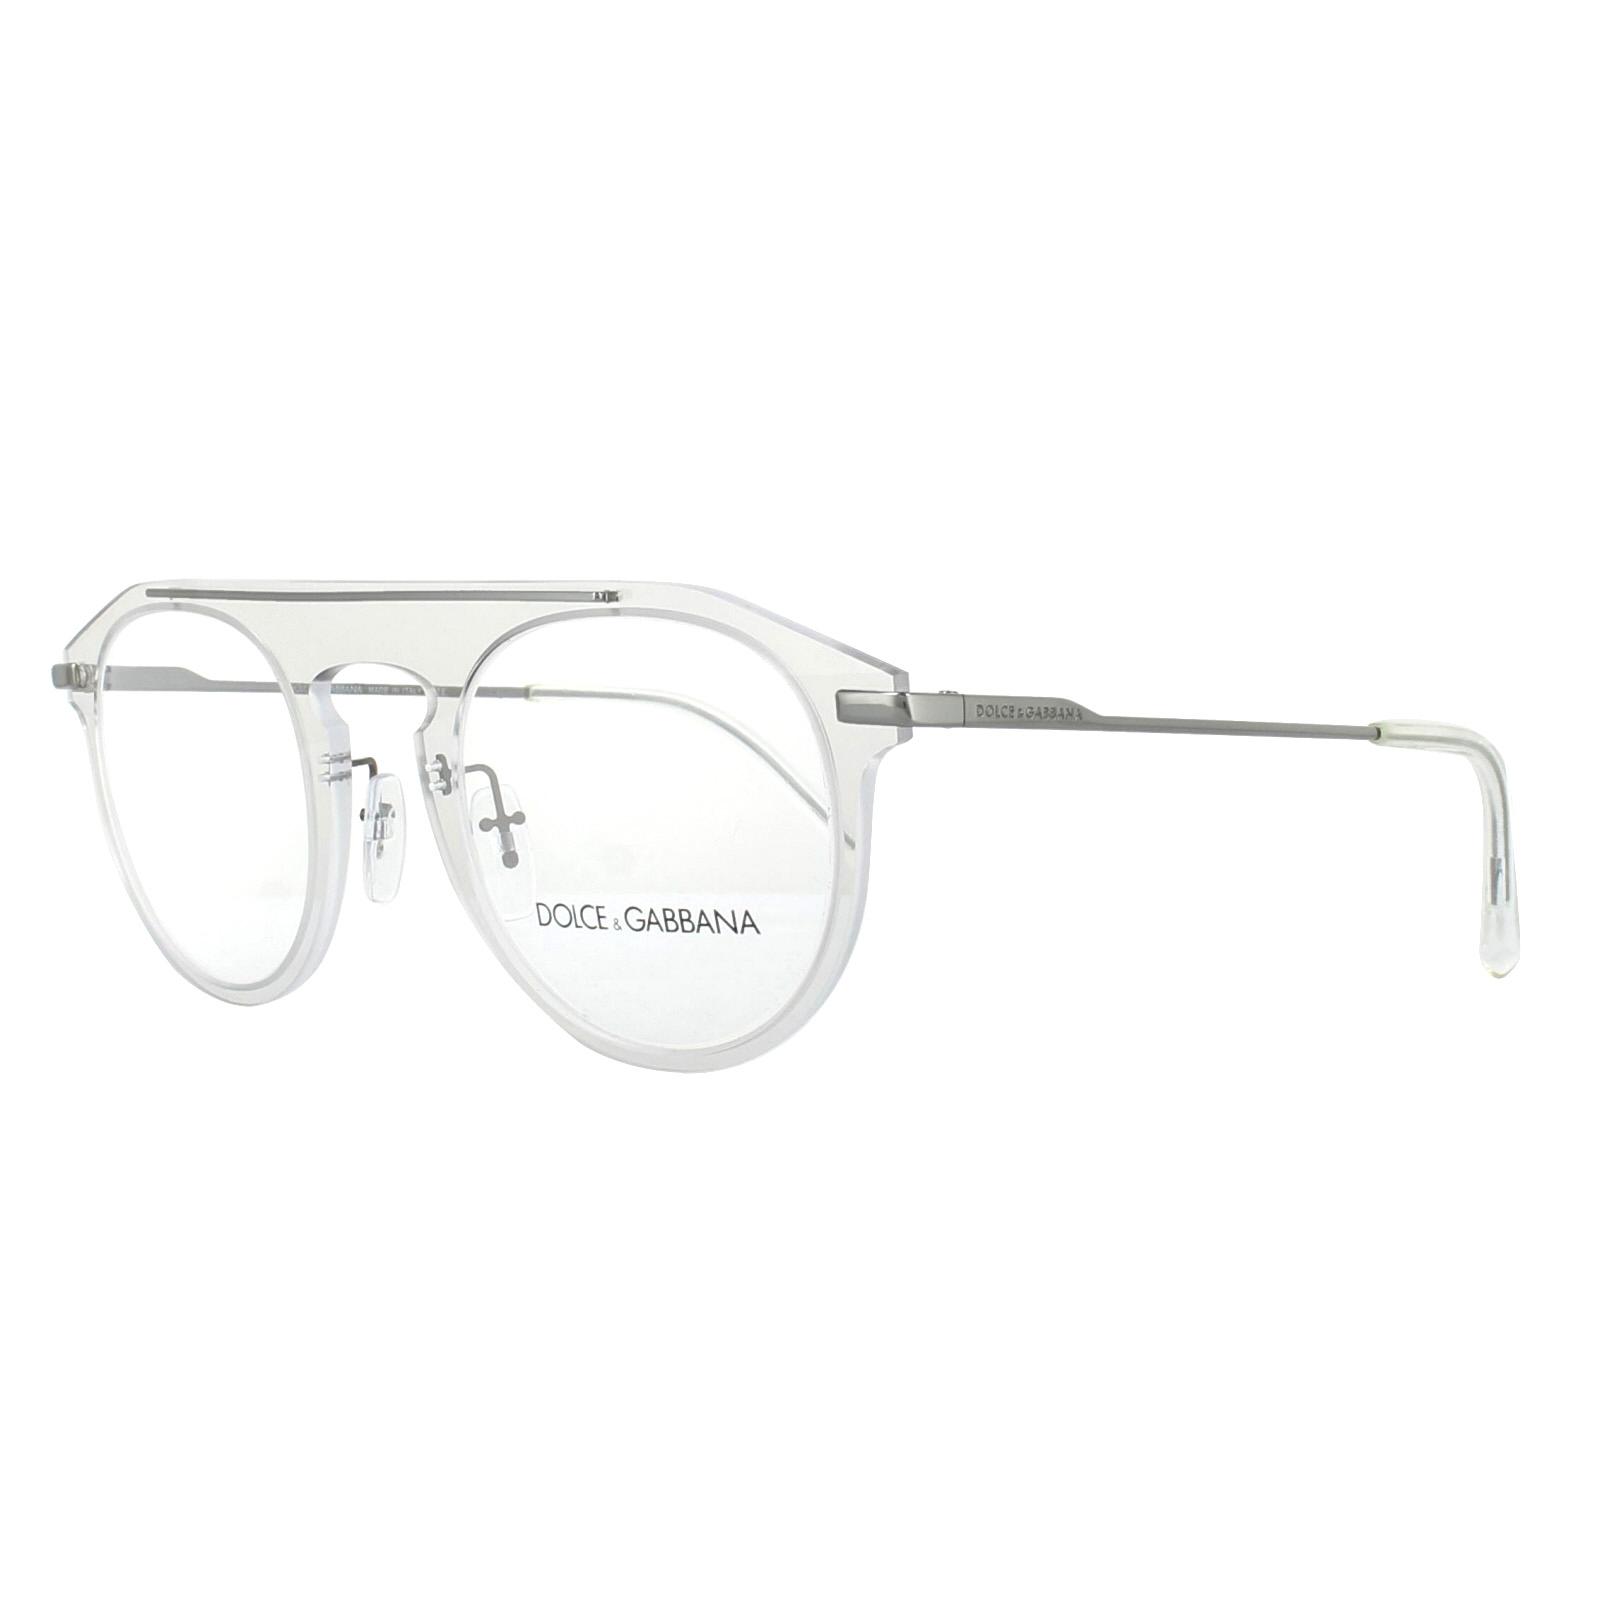 a03b006e298 Sentinel Dolce   Gabbana Glasses Frames DG 1291 04 Clear 48mm Mens